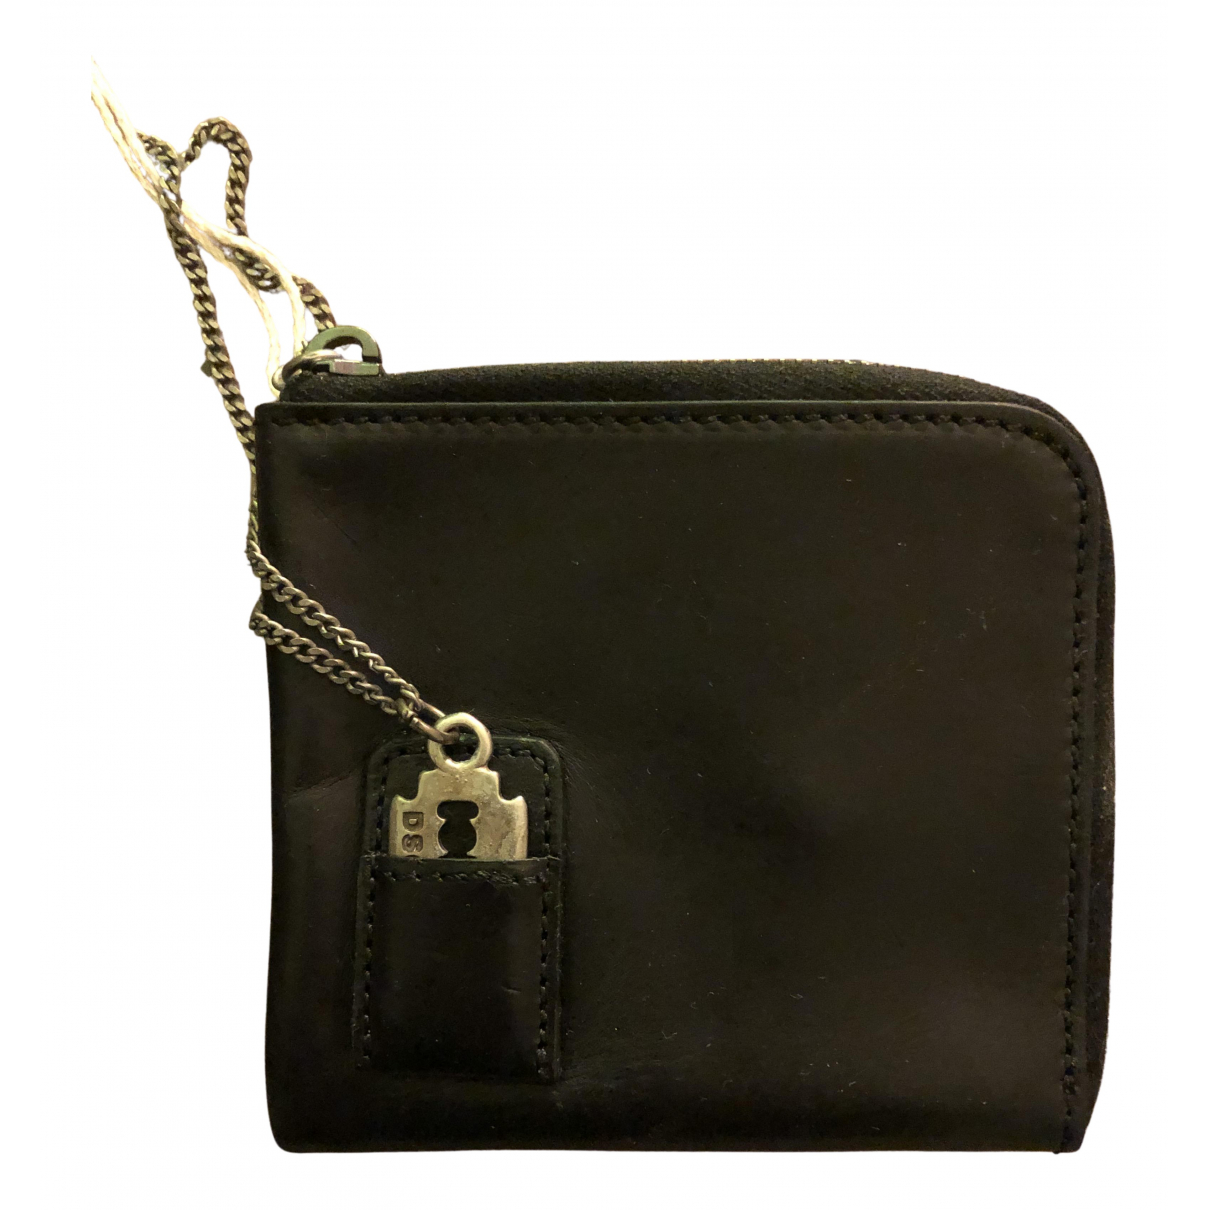 Dsquared2 N Black Leather Small bag, wallet & cases for Men N